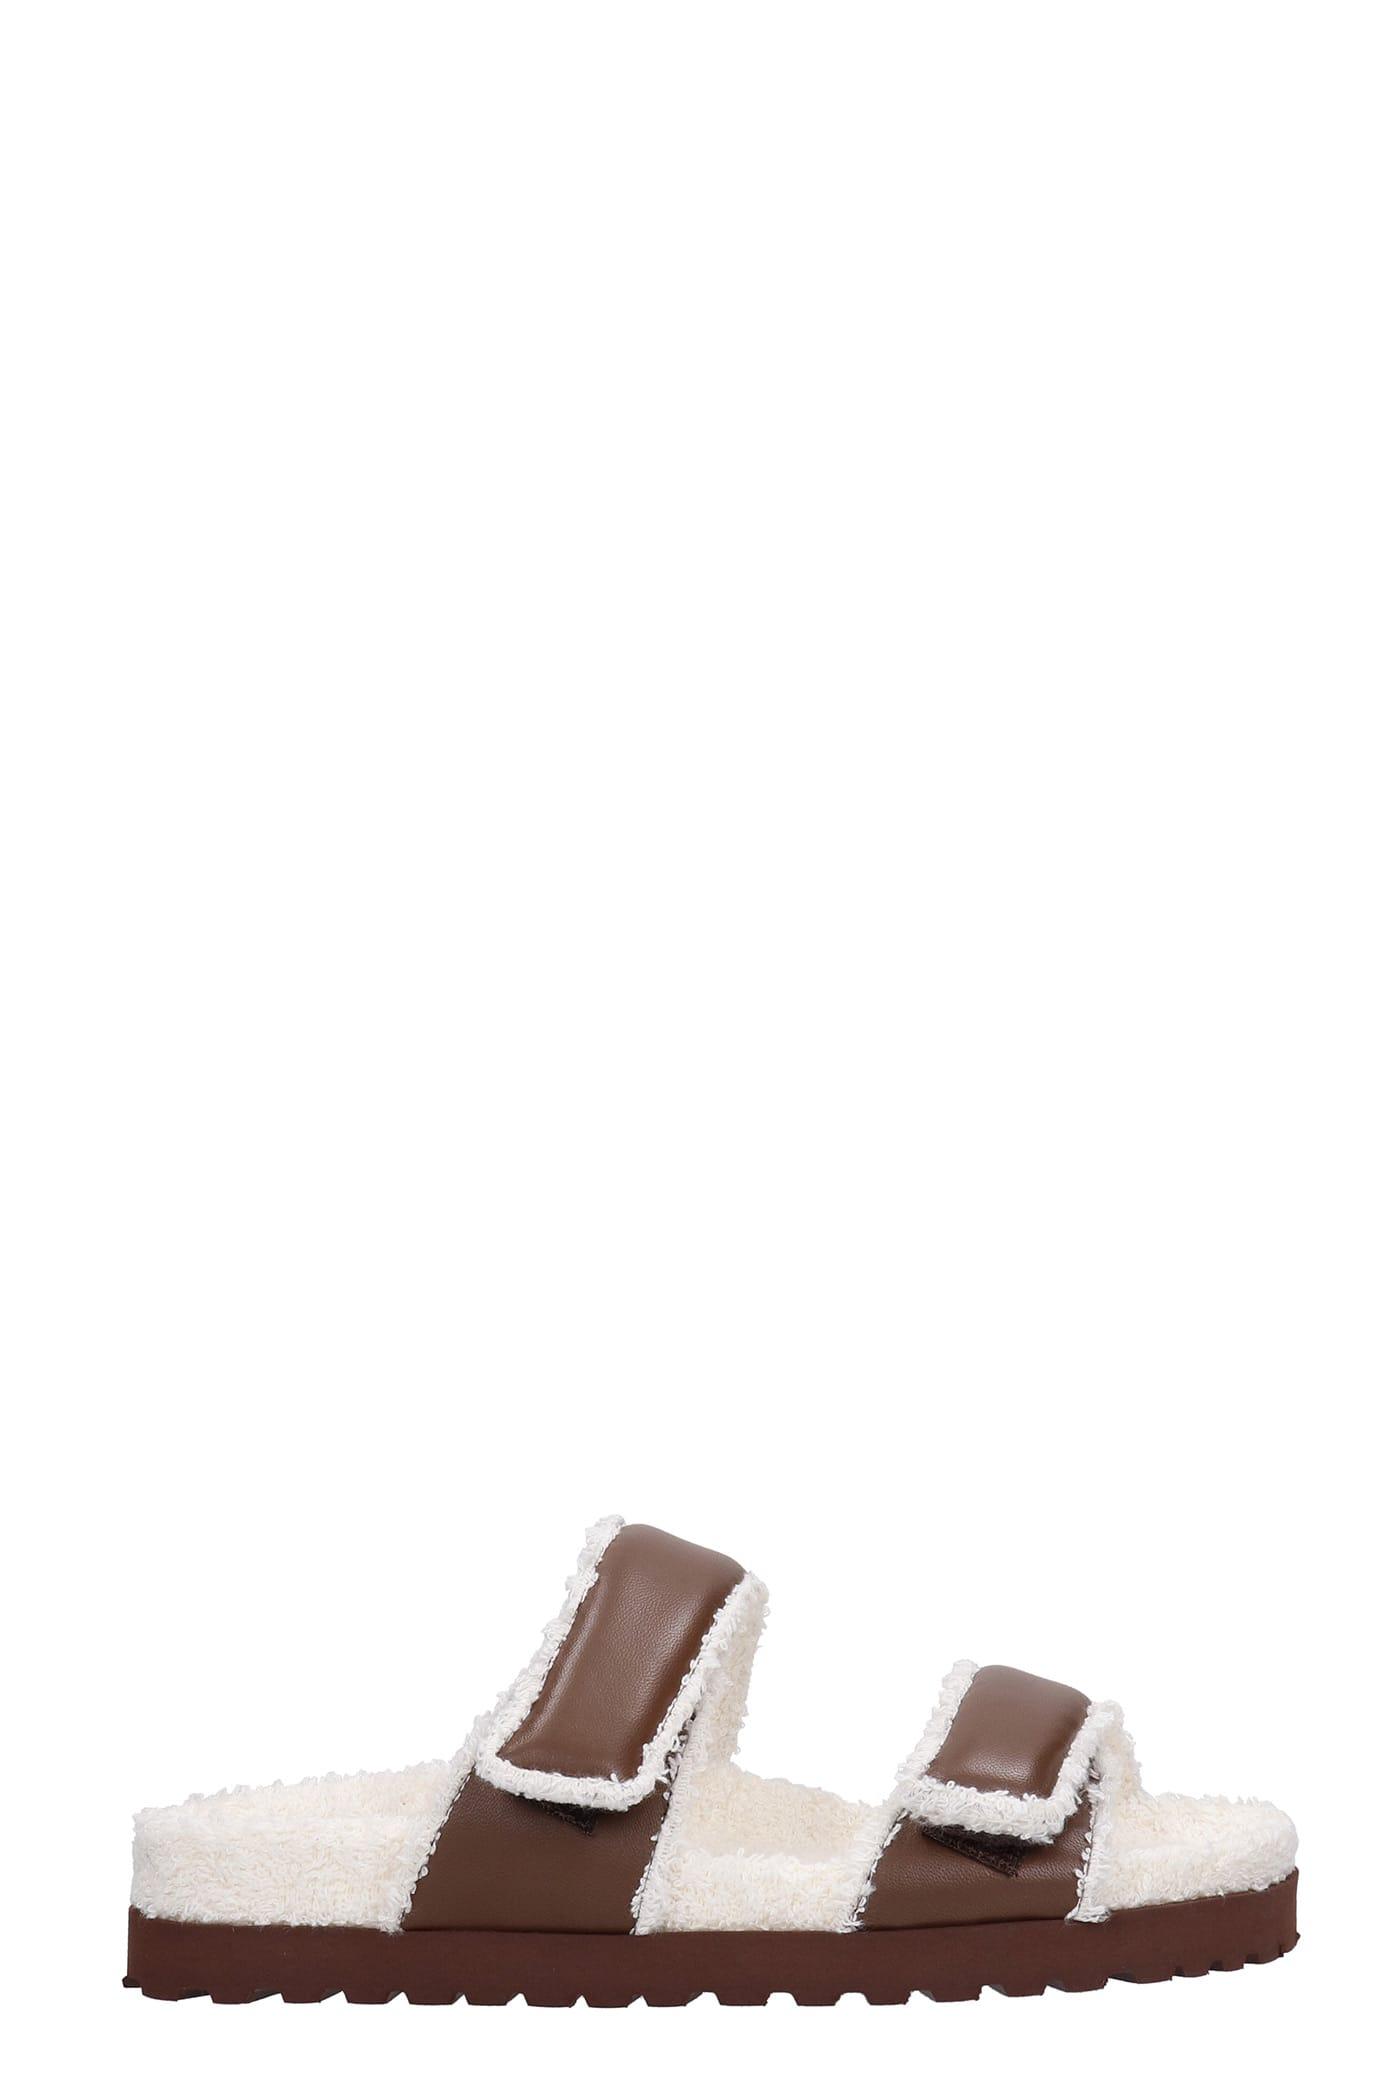 Perni 11 Flats In Brown Leather